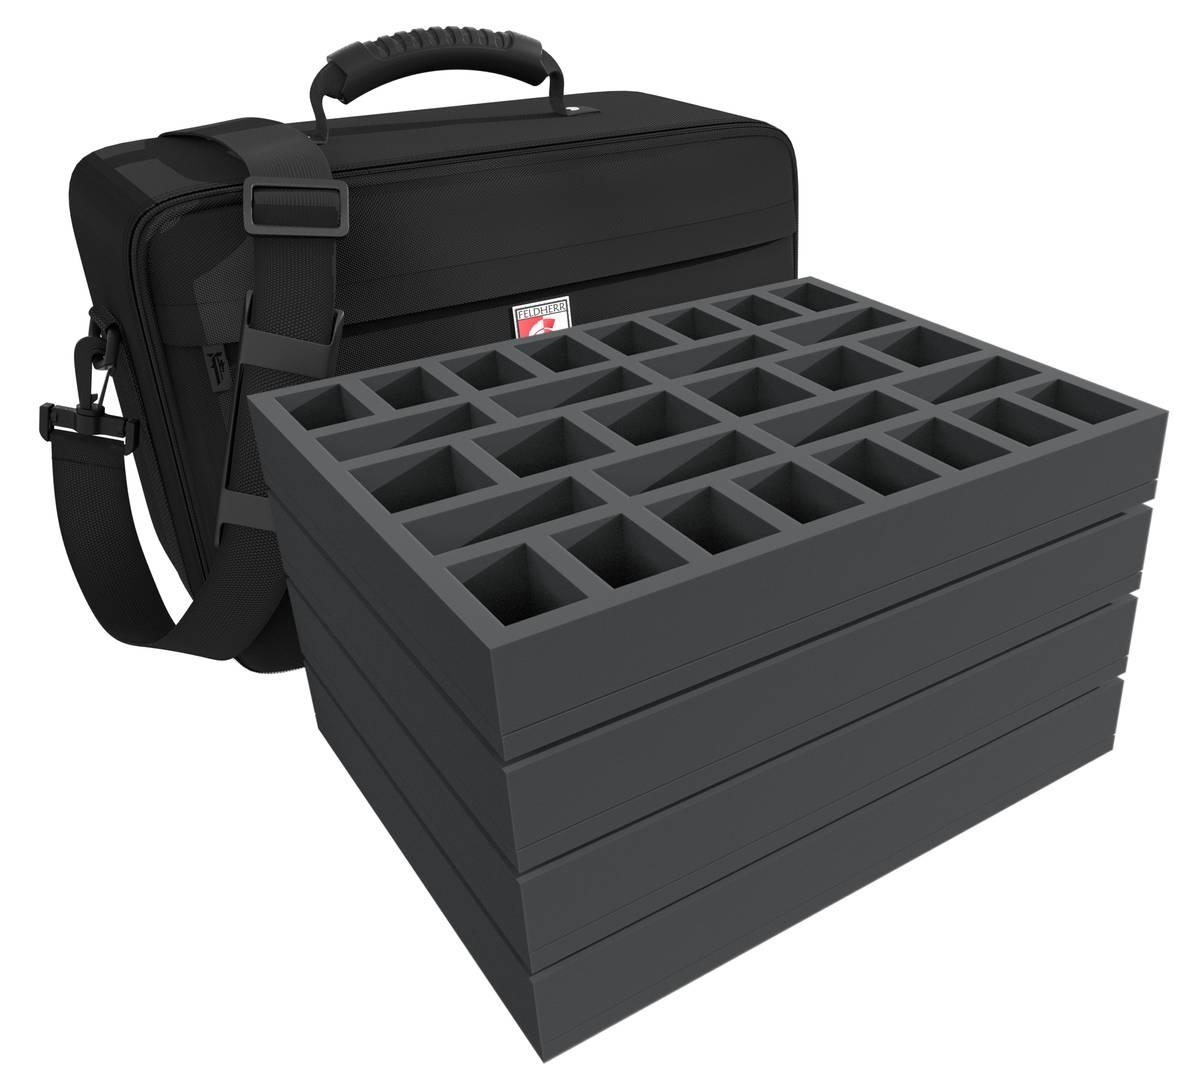 Feldherr MAXI bag for 124 miniatures